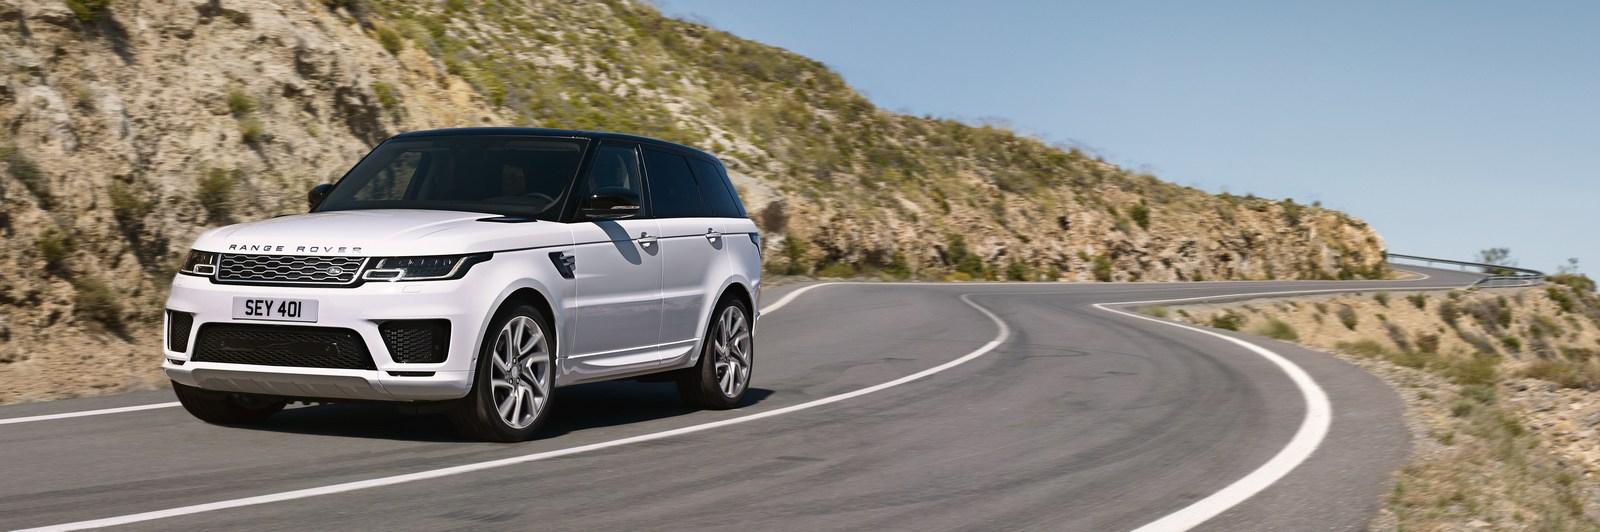 Range-Rover-Sport-46